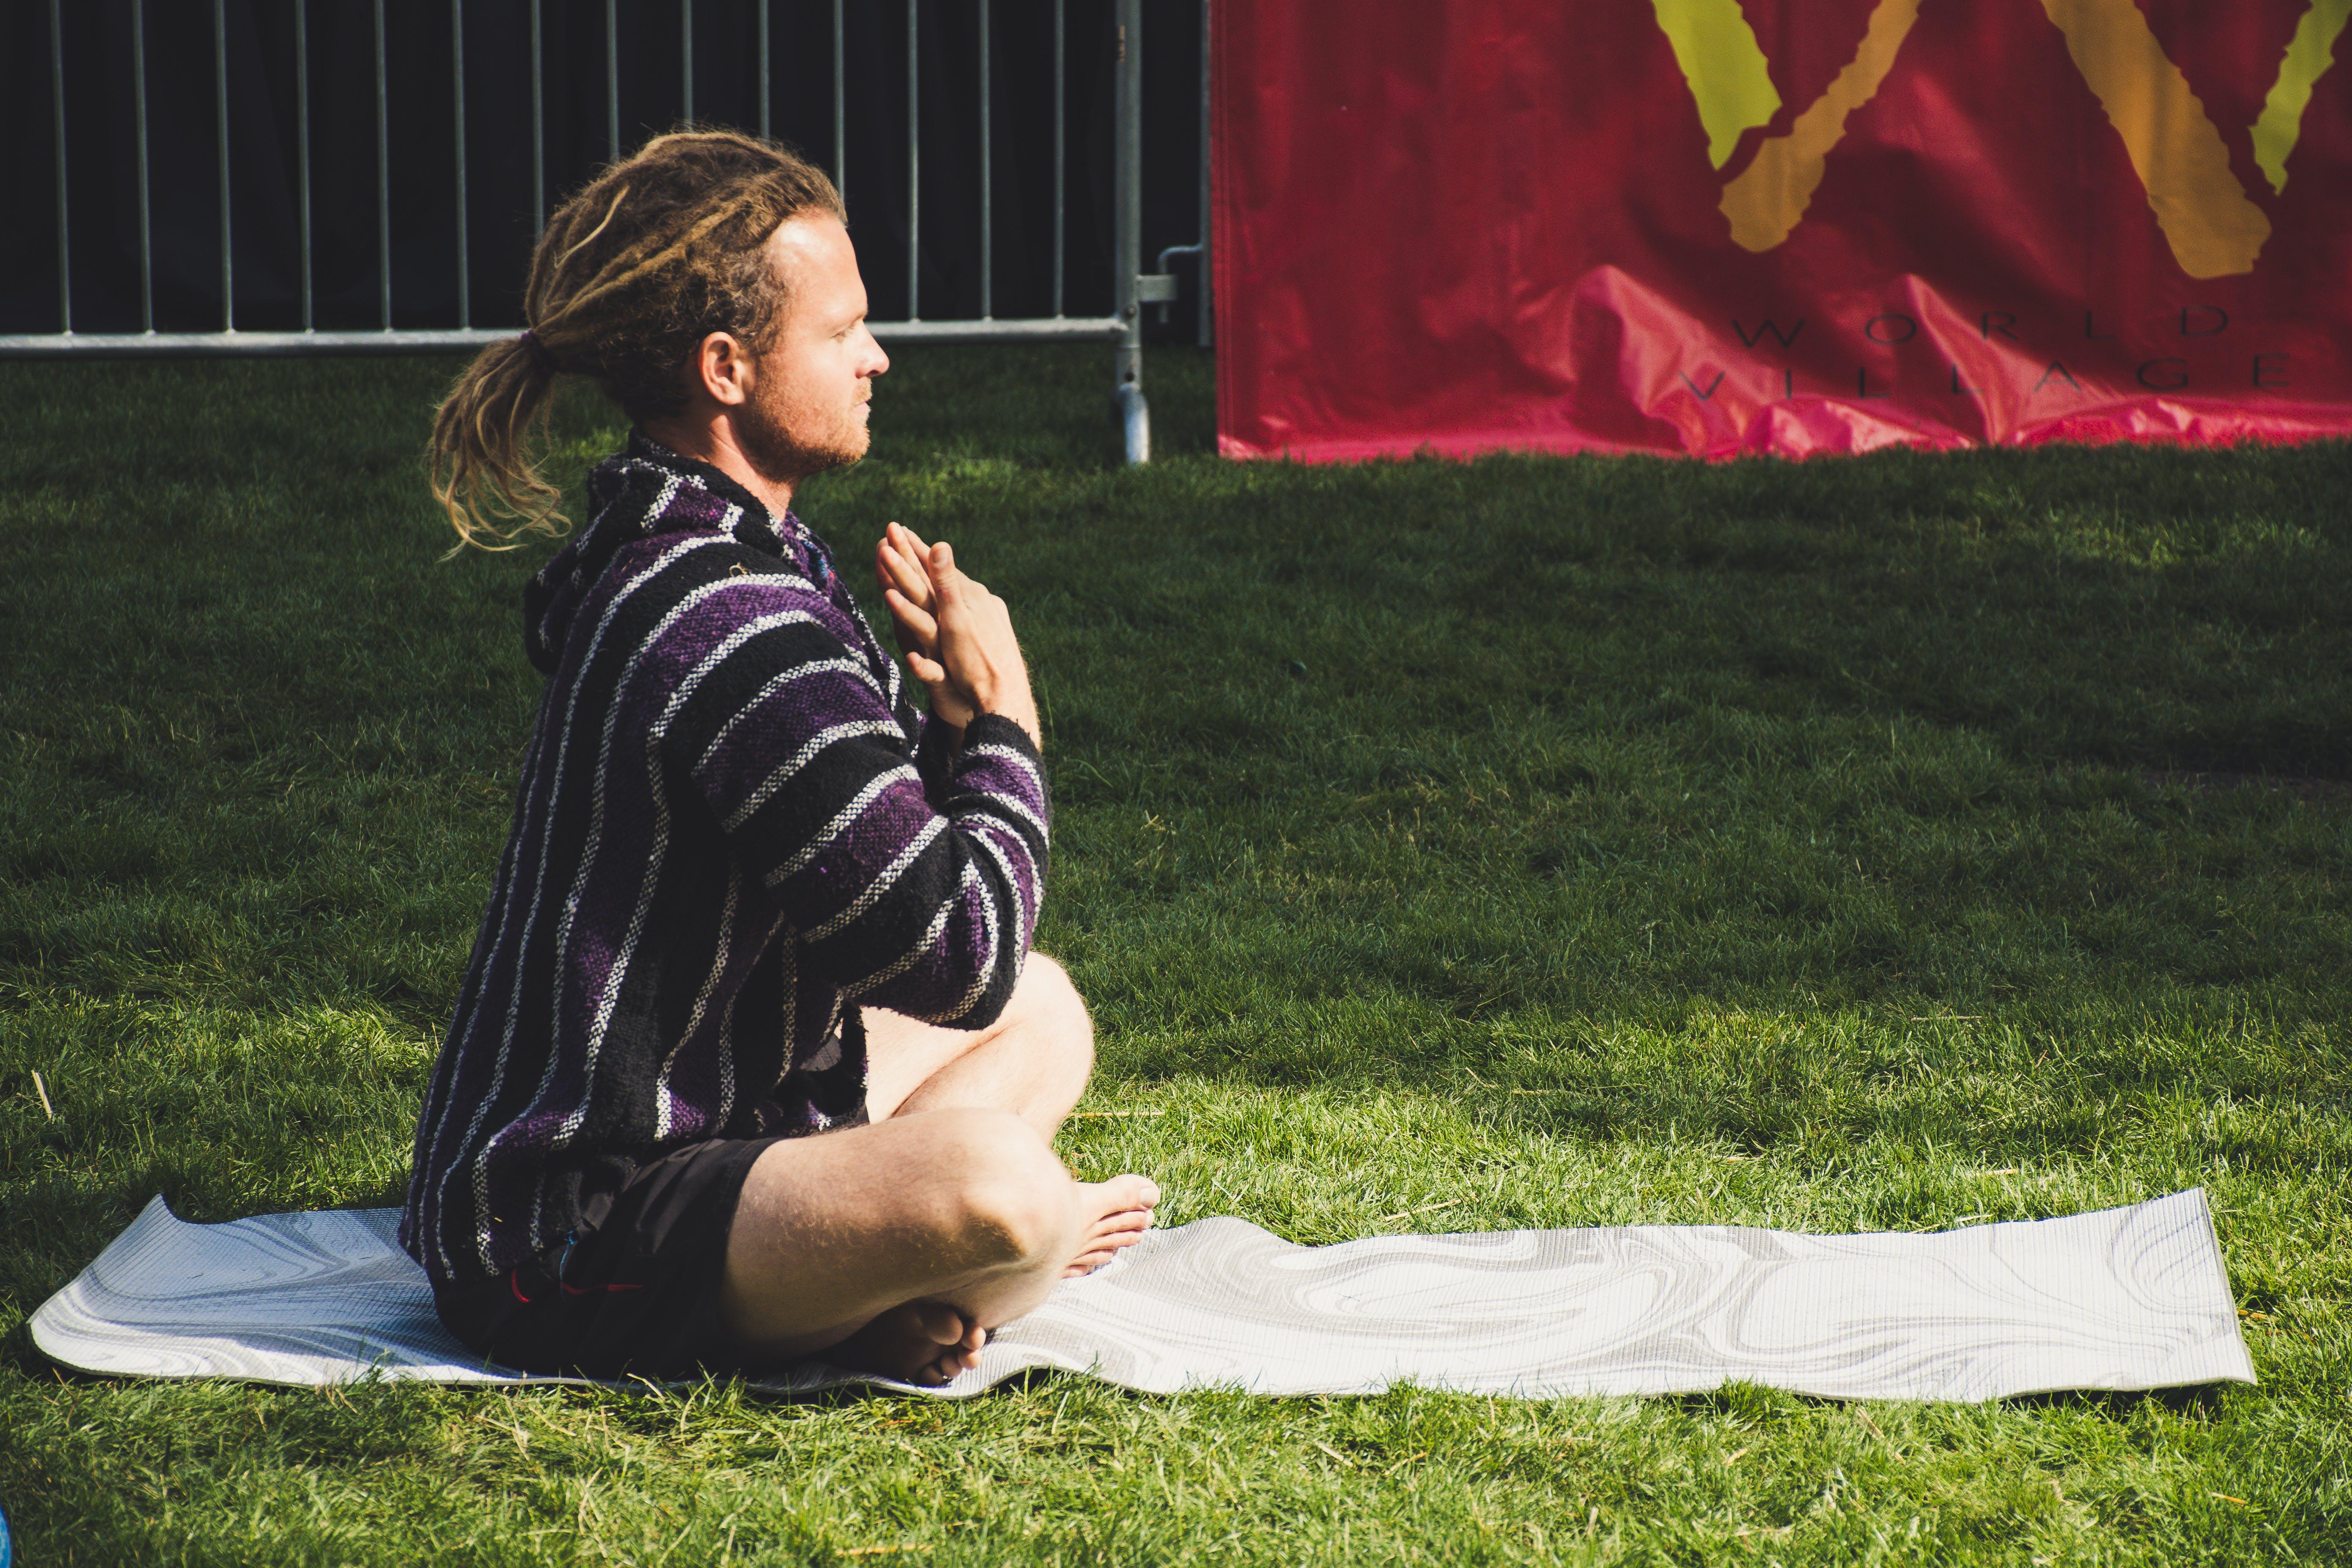 Man Doing Yoga Outdoor